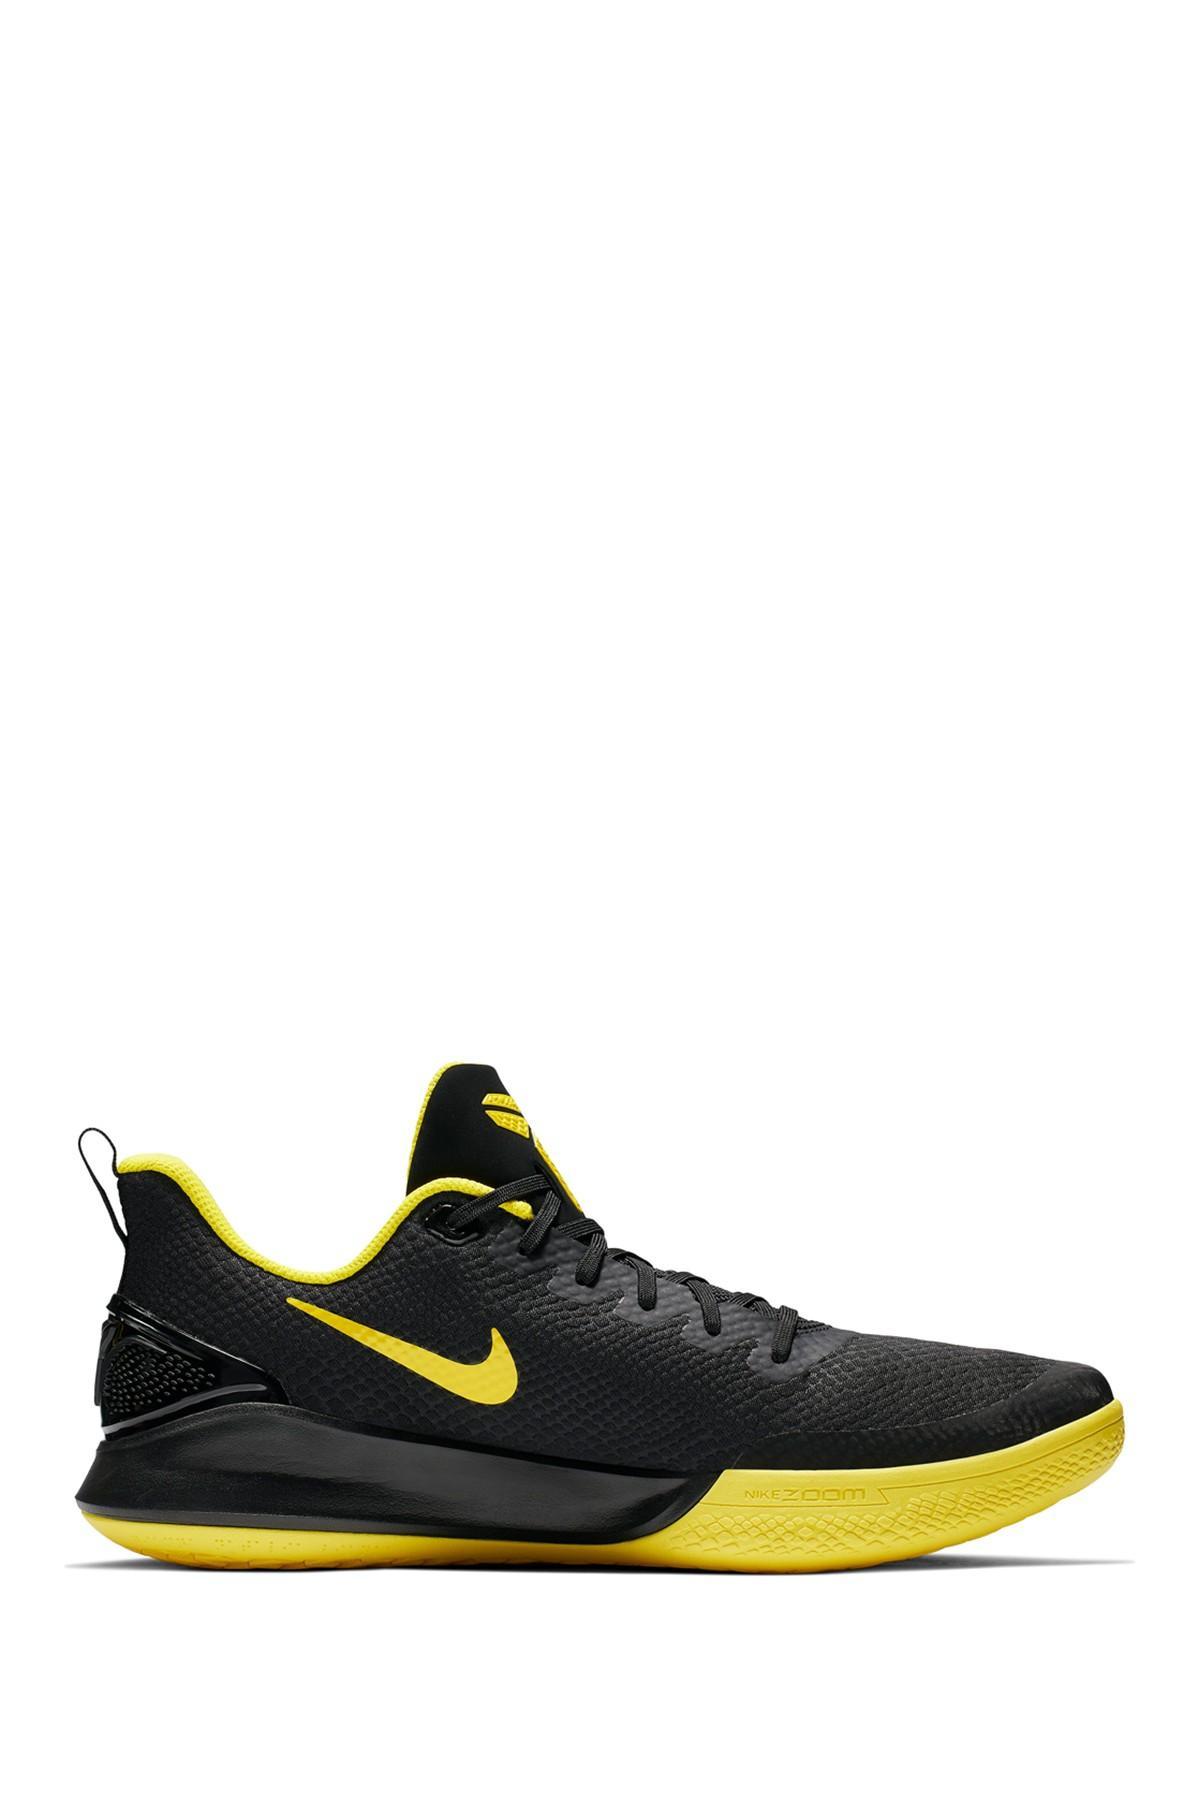 Nike Kobe Mamba Focus Basketball Shoes in Black for Men - Lyst